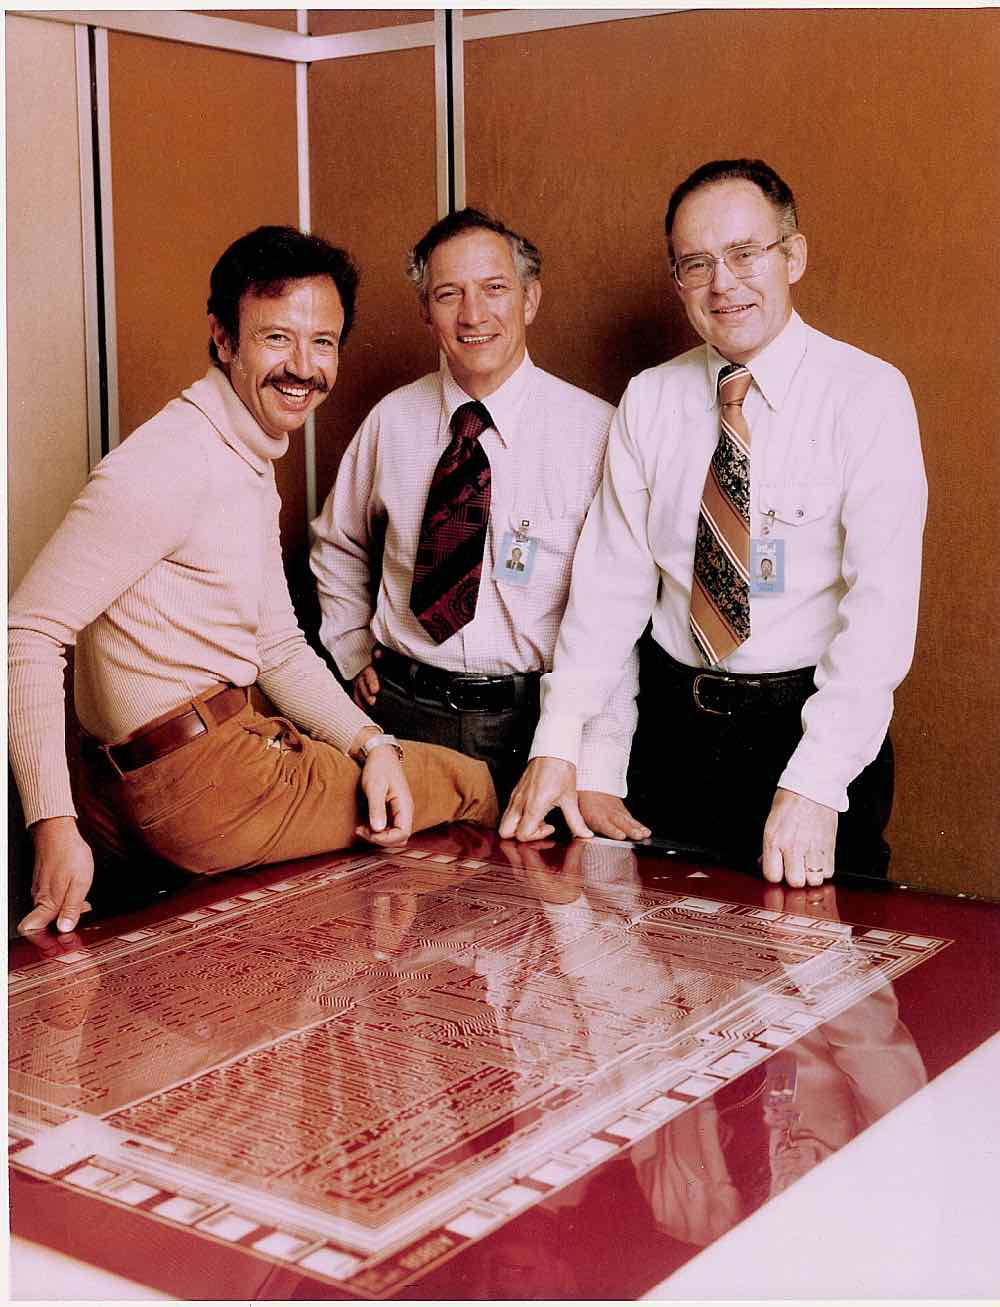 Andy Grove, Robert Noyce, and Gordon Moore